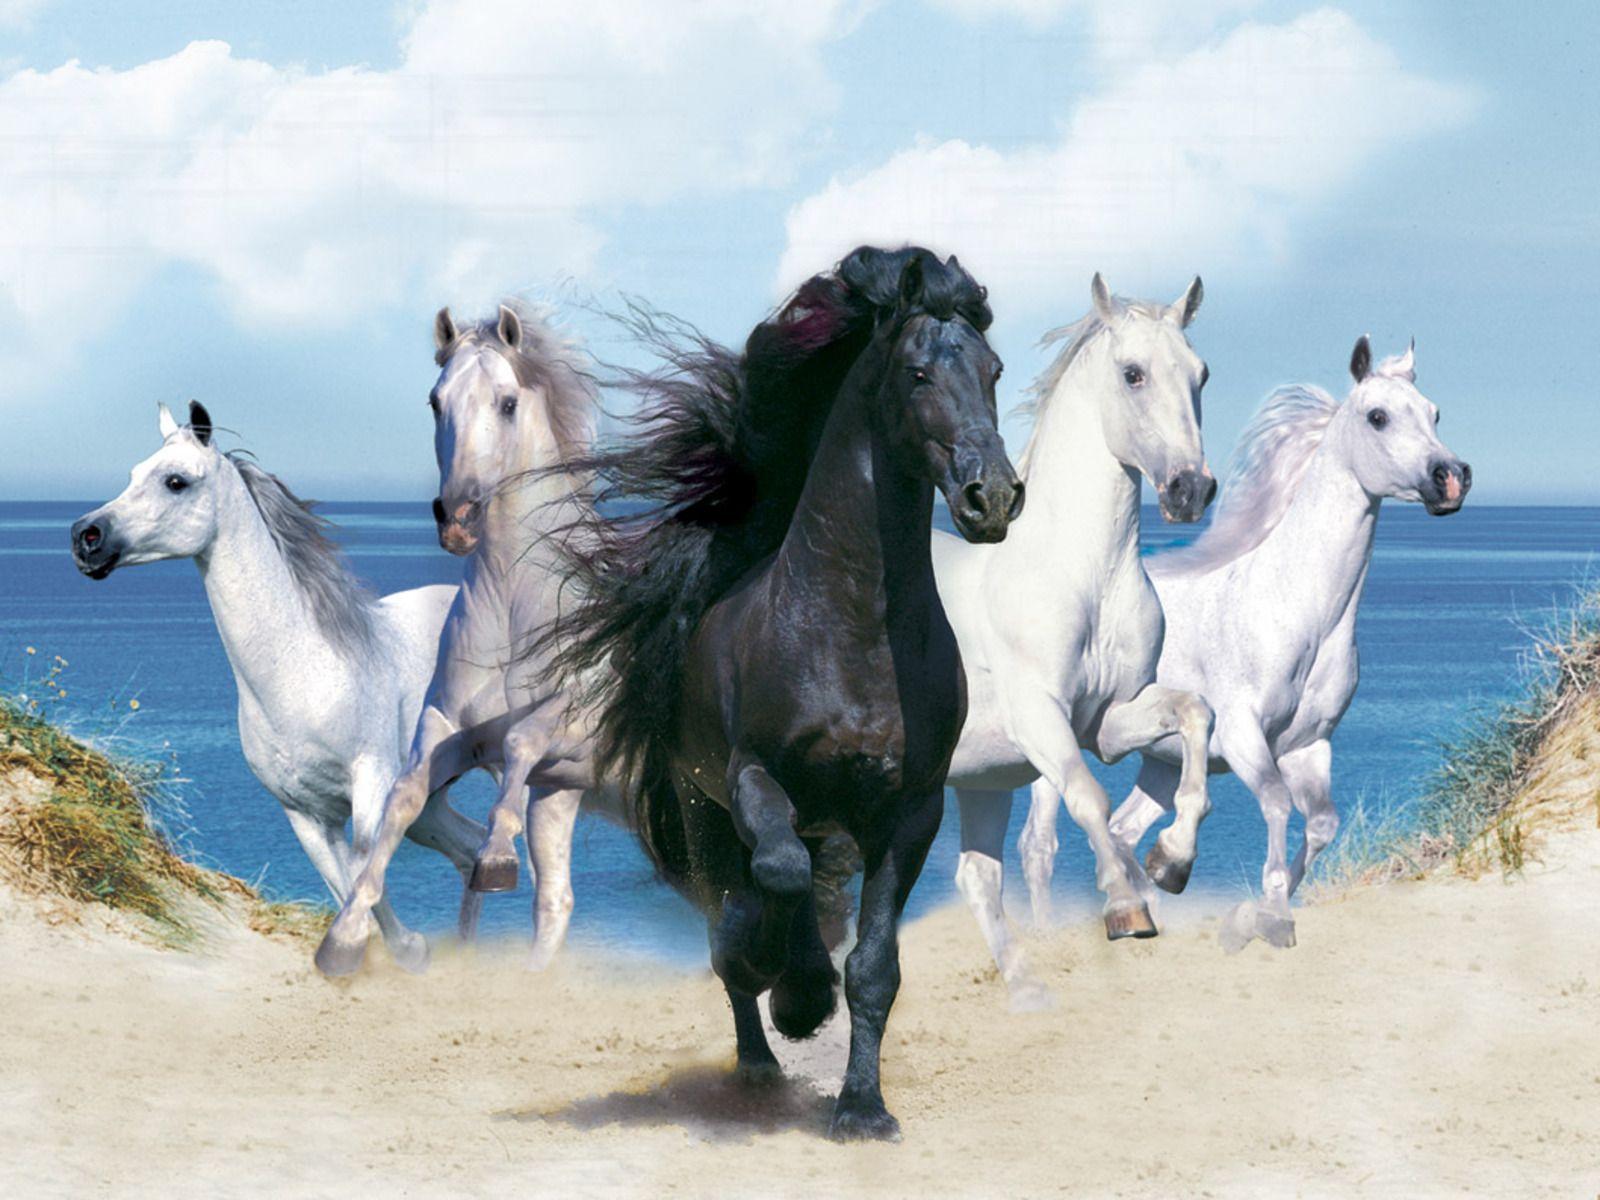 gif horse images the wallpaper backgrounds i 39 ld. Black Bedroom Furniture Sets. Home Design Ideas